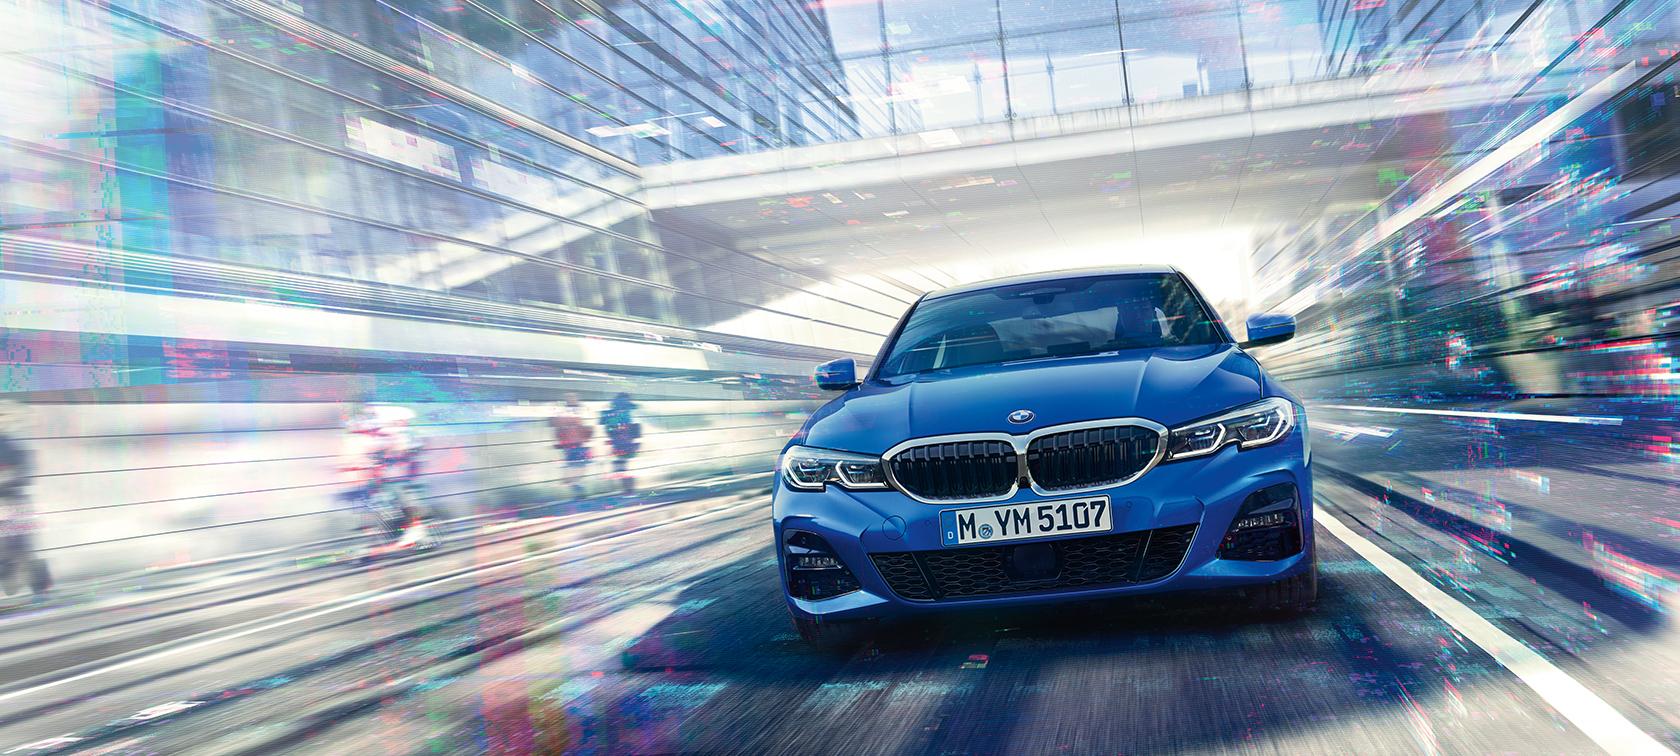 BMW Sri Lanka